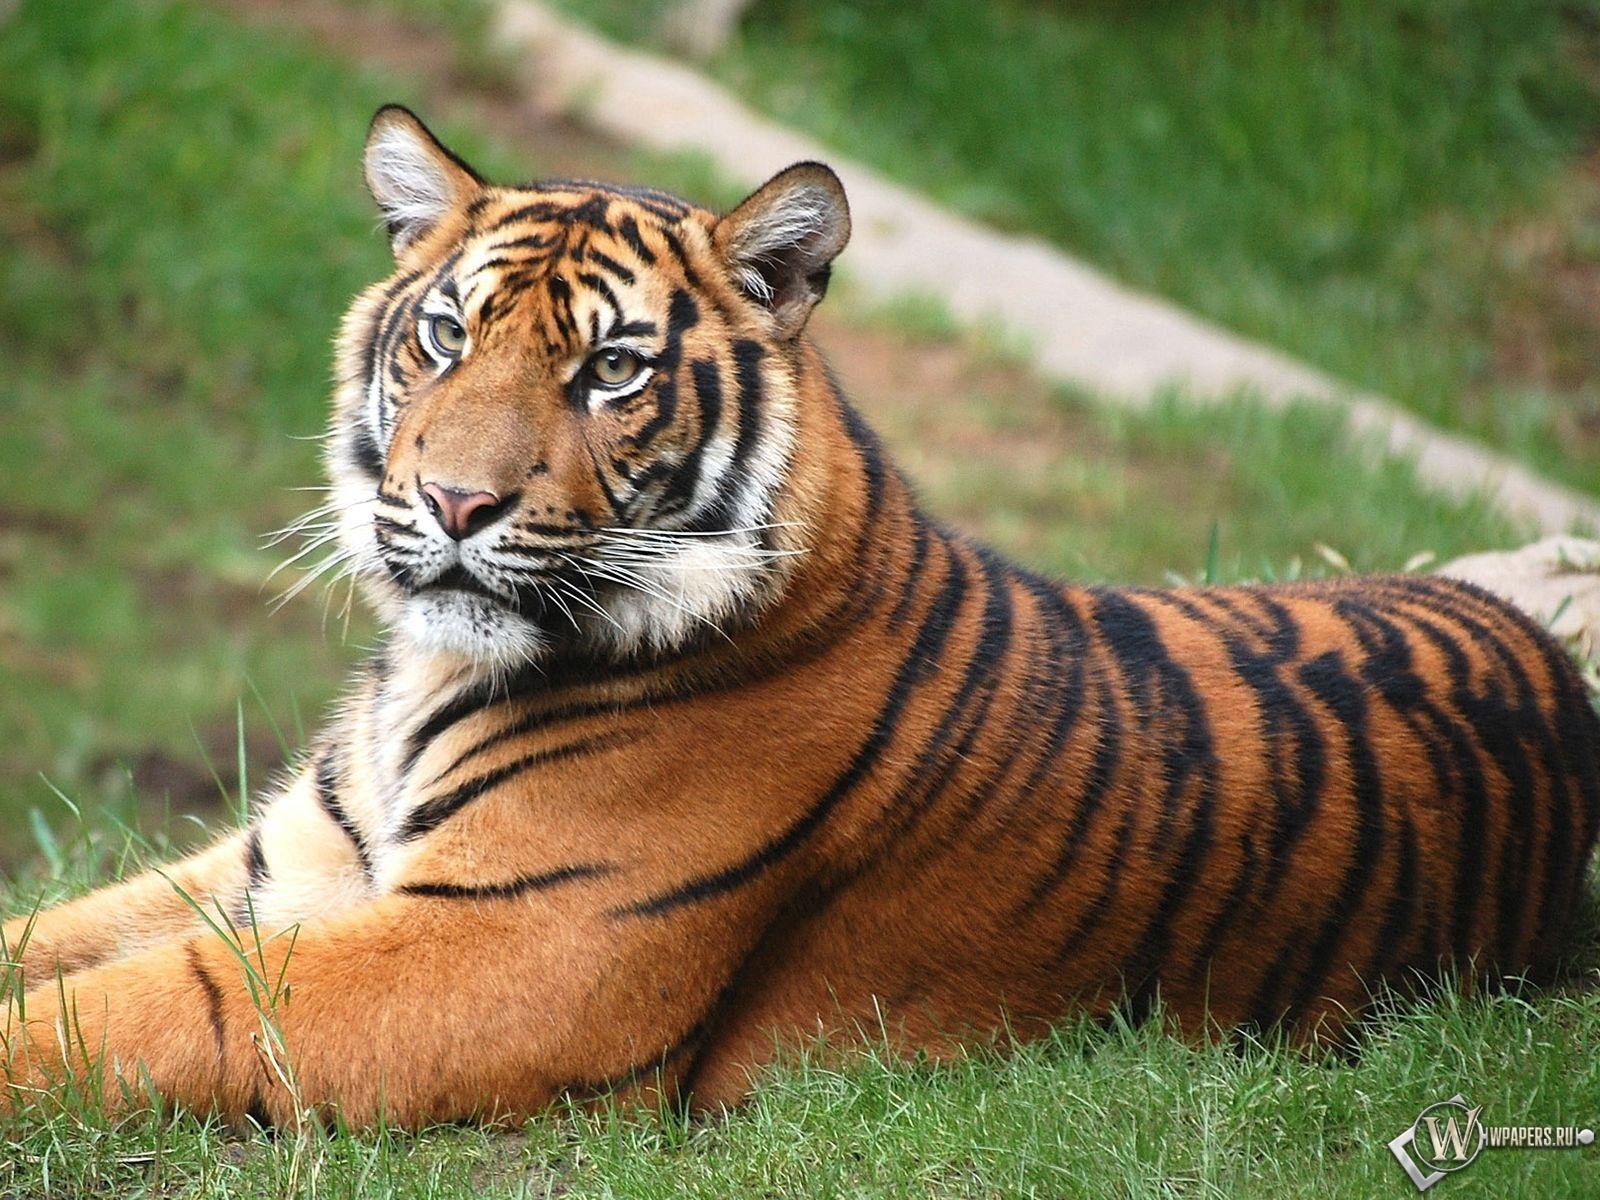 Тигр на лужайке 1600x1200